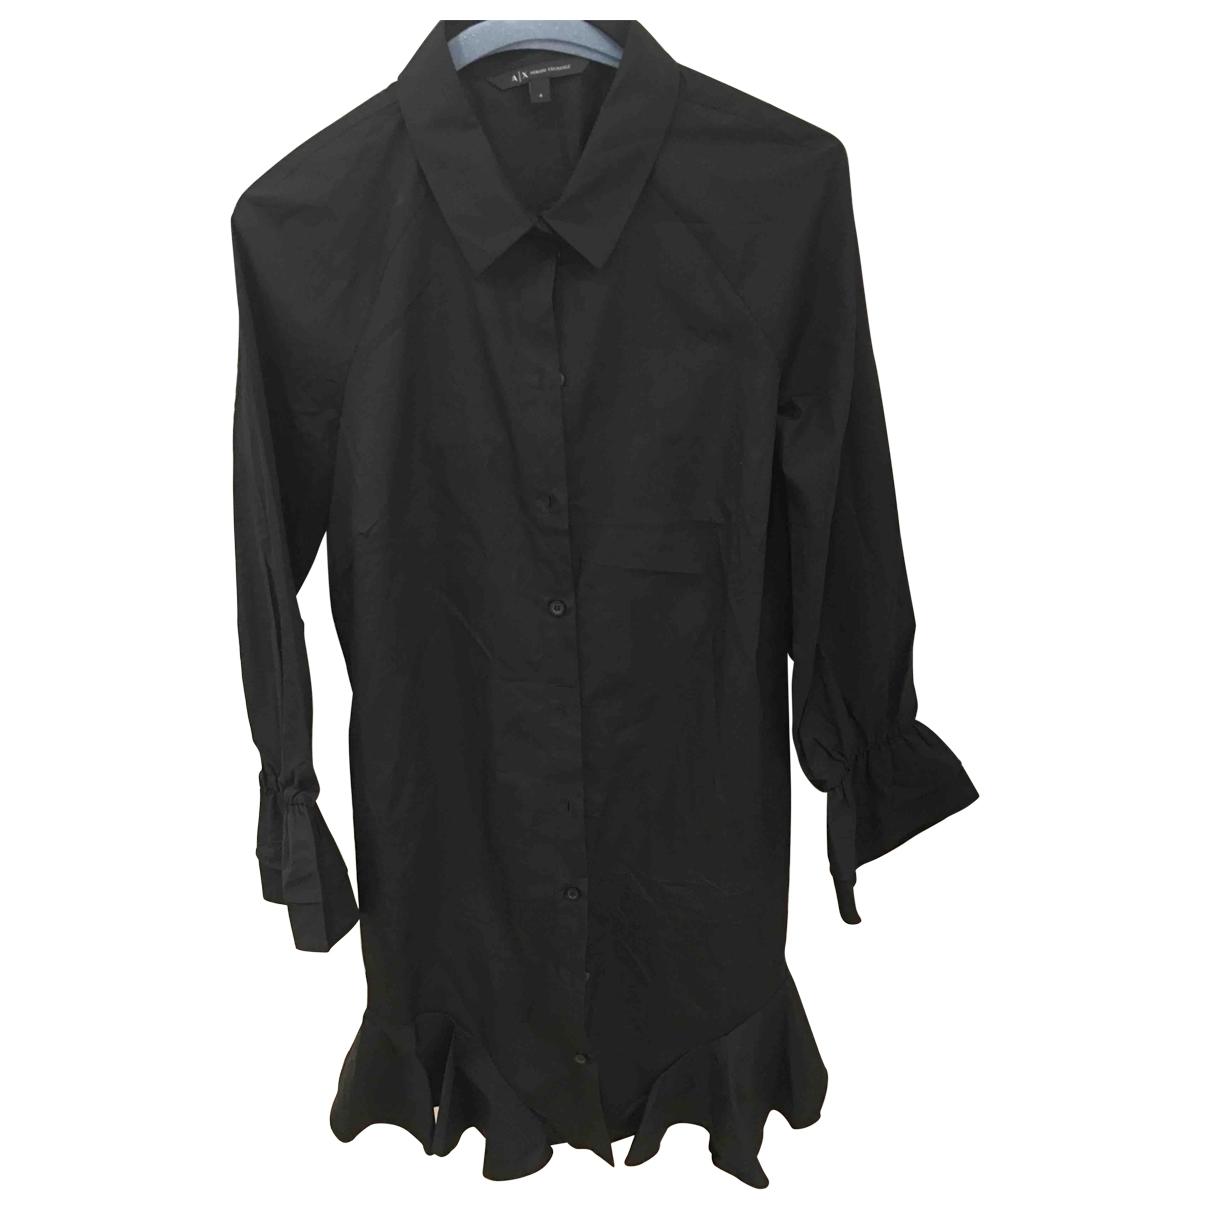 Emporio Armani \N Black Cotton dress for Women 4 UK